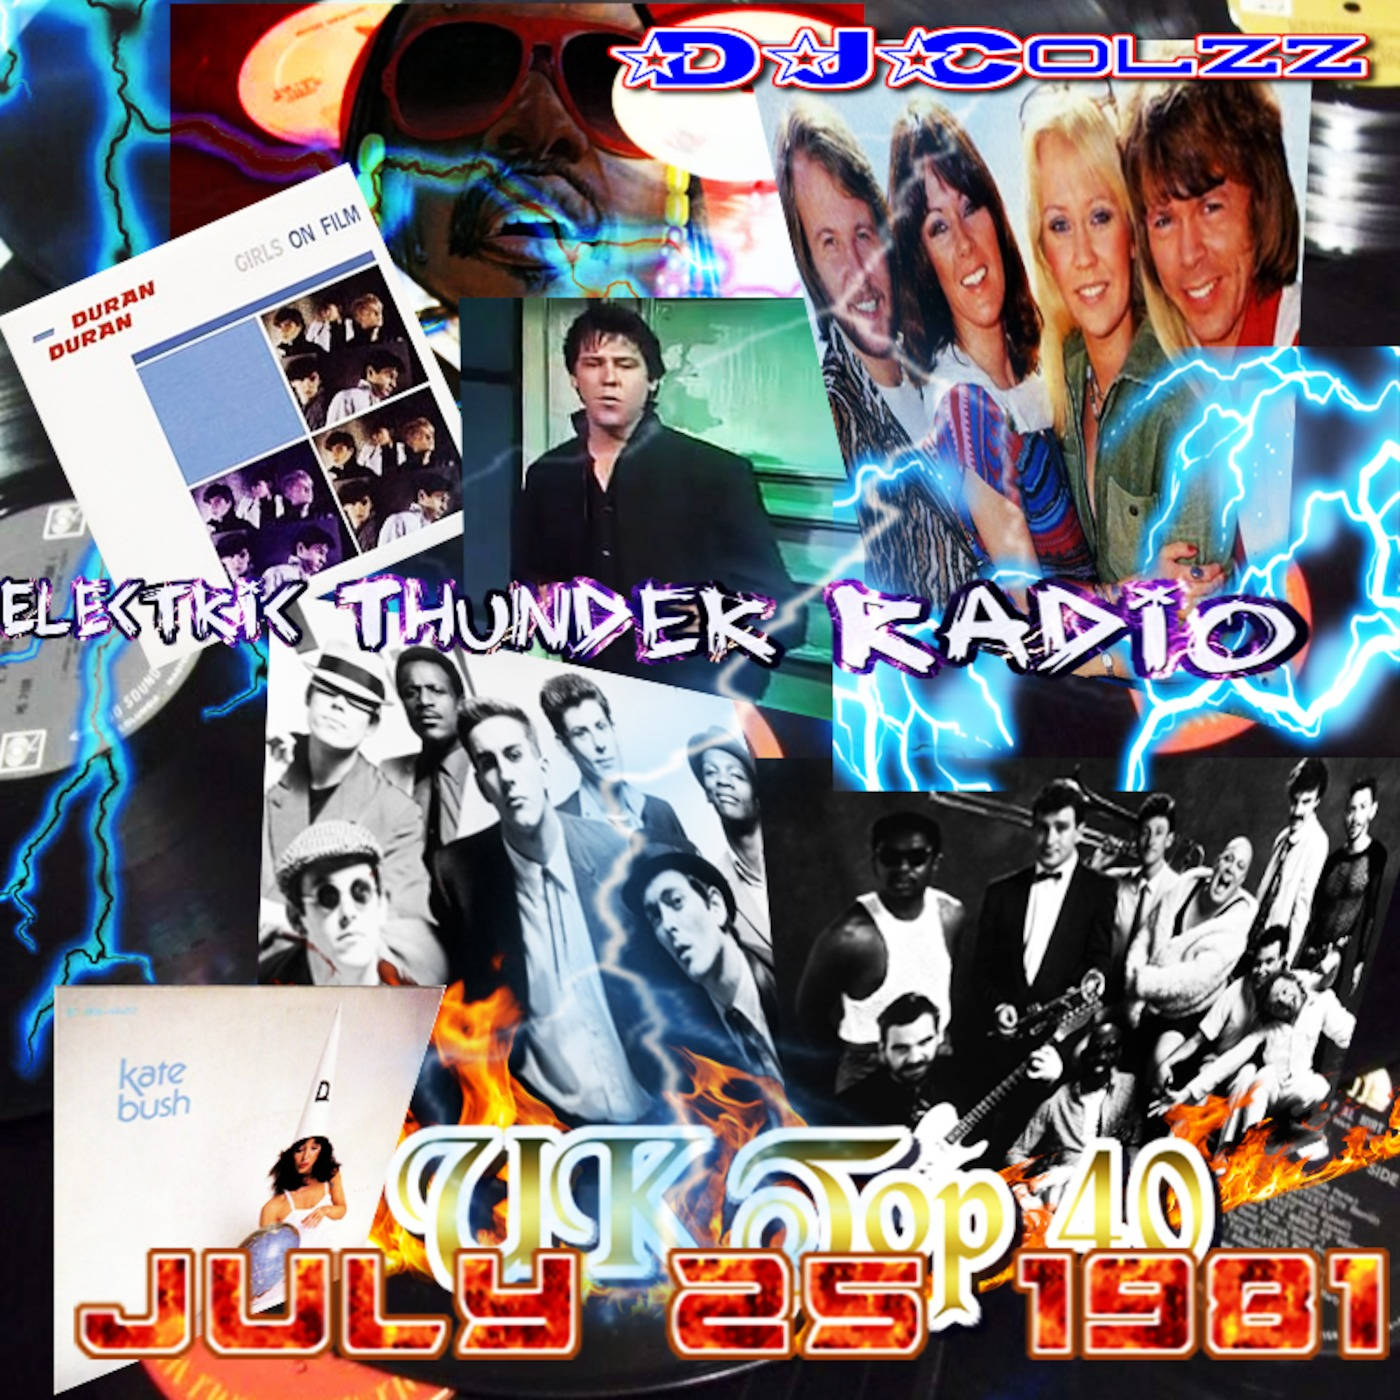 UK Top 40 Singles July 25 1981 Electric Thunder Radio podcast